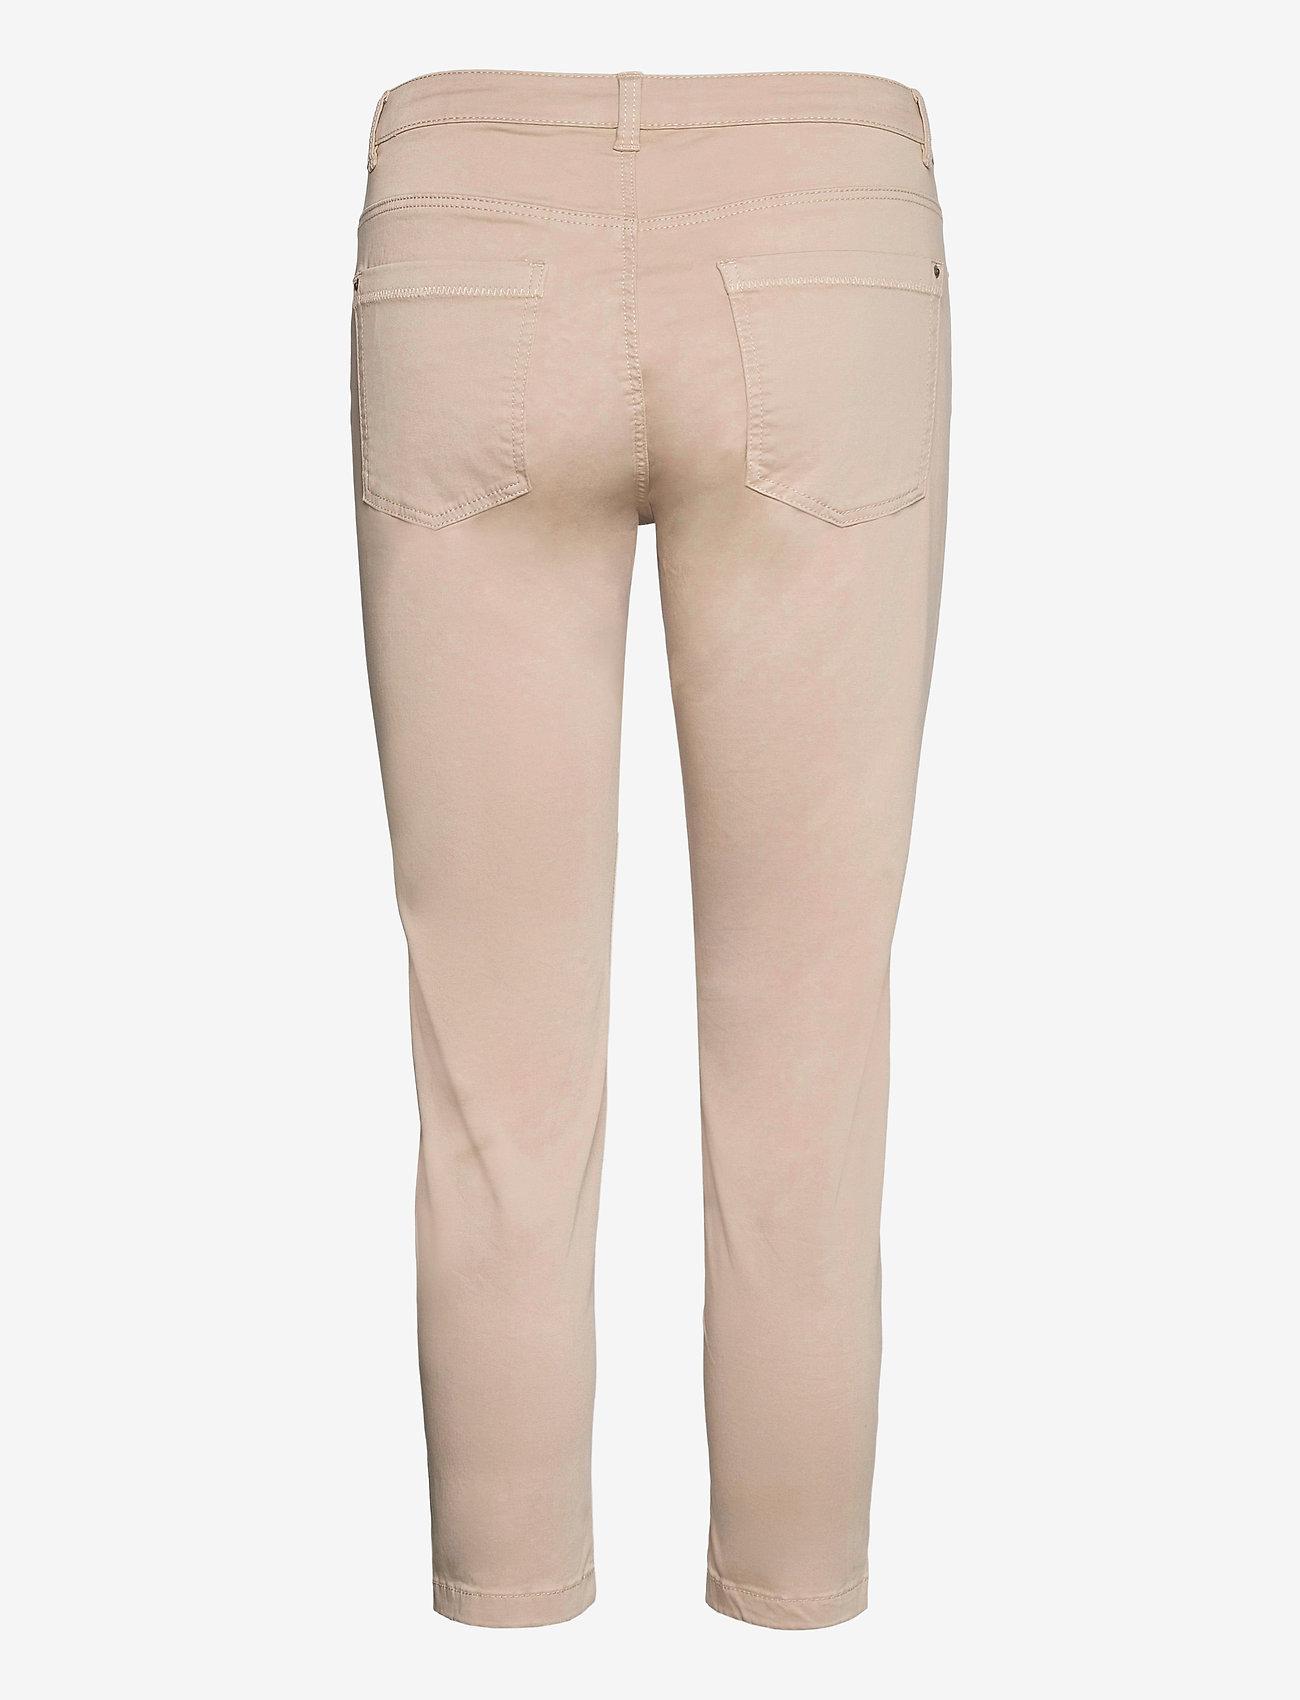 Esprit Casual - Pants woven - slim fit bukser - light beige - 1